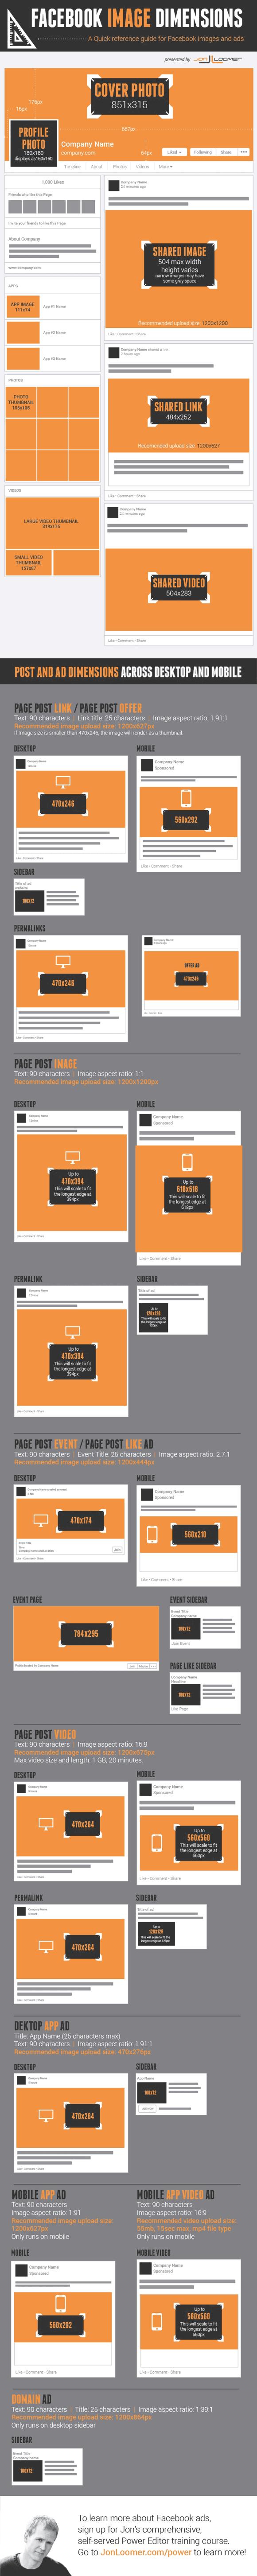 infografia branding dimensiones facebook